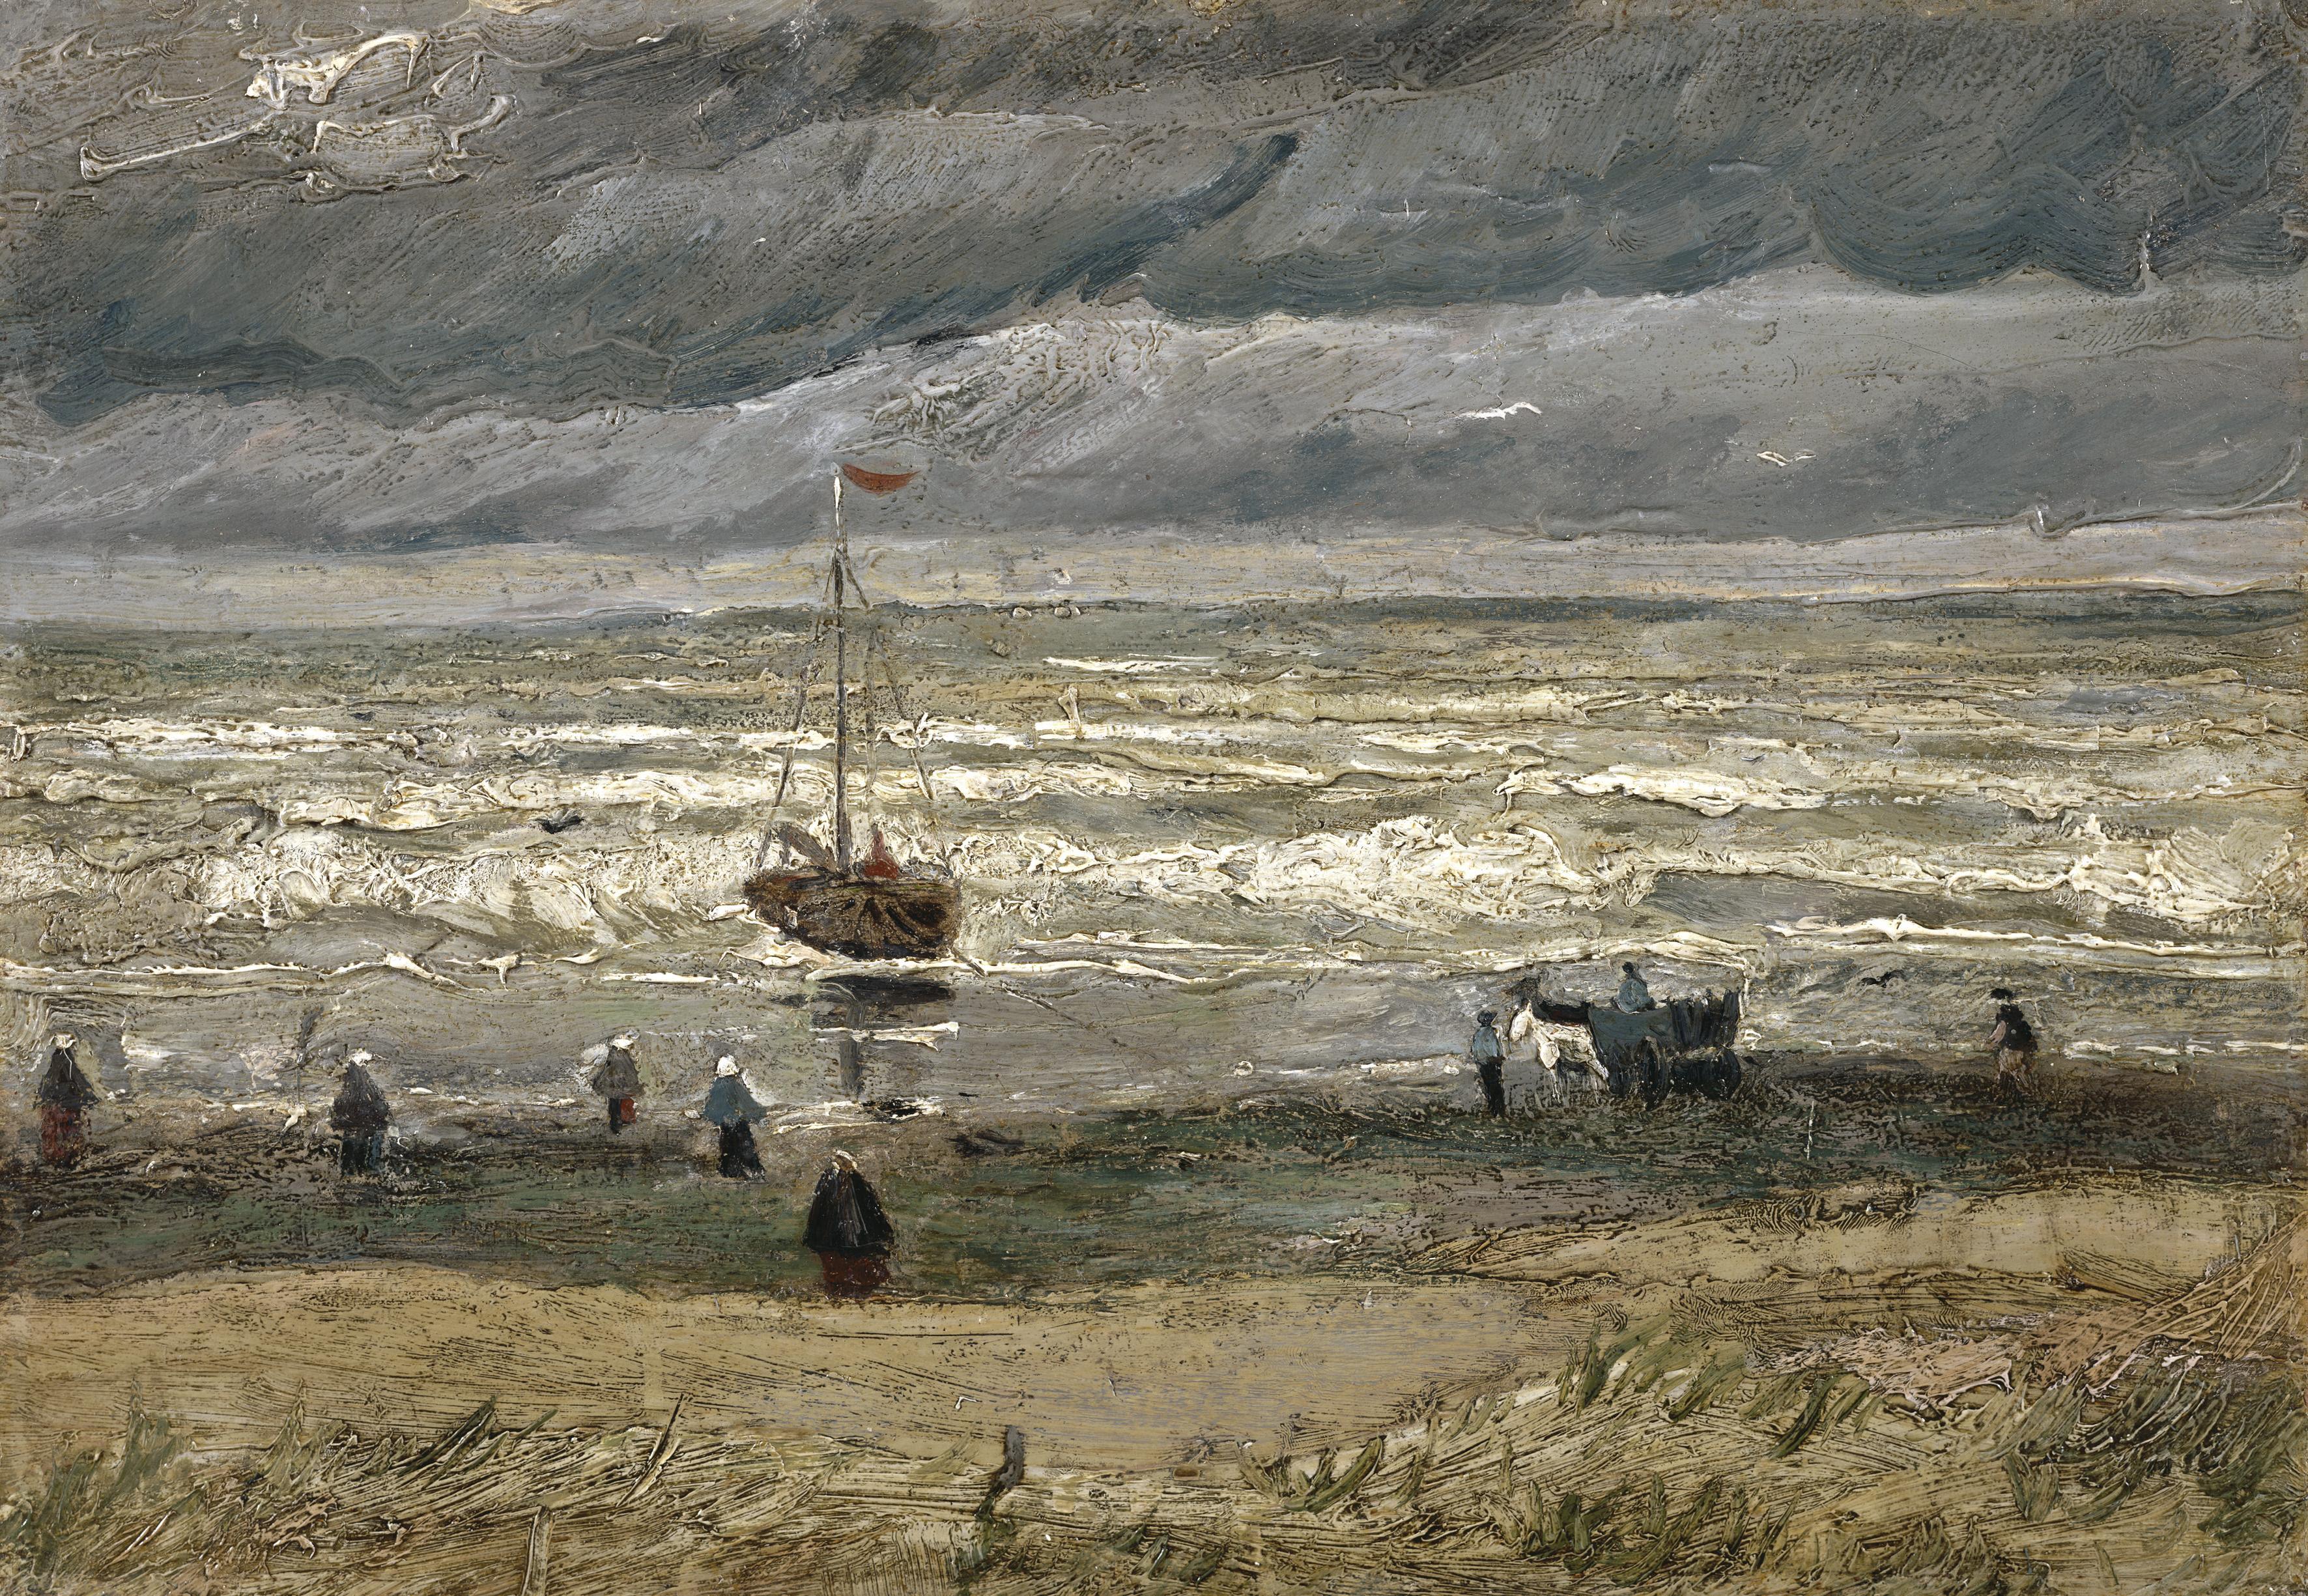 http://www.thehistoryblog.com/wp-content/uploads/2016/09/Vincent-van-Gogh-View-of-the-Sea-at-Scheveningen-1882.jpg